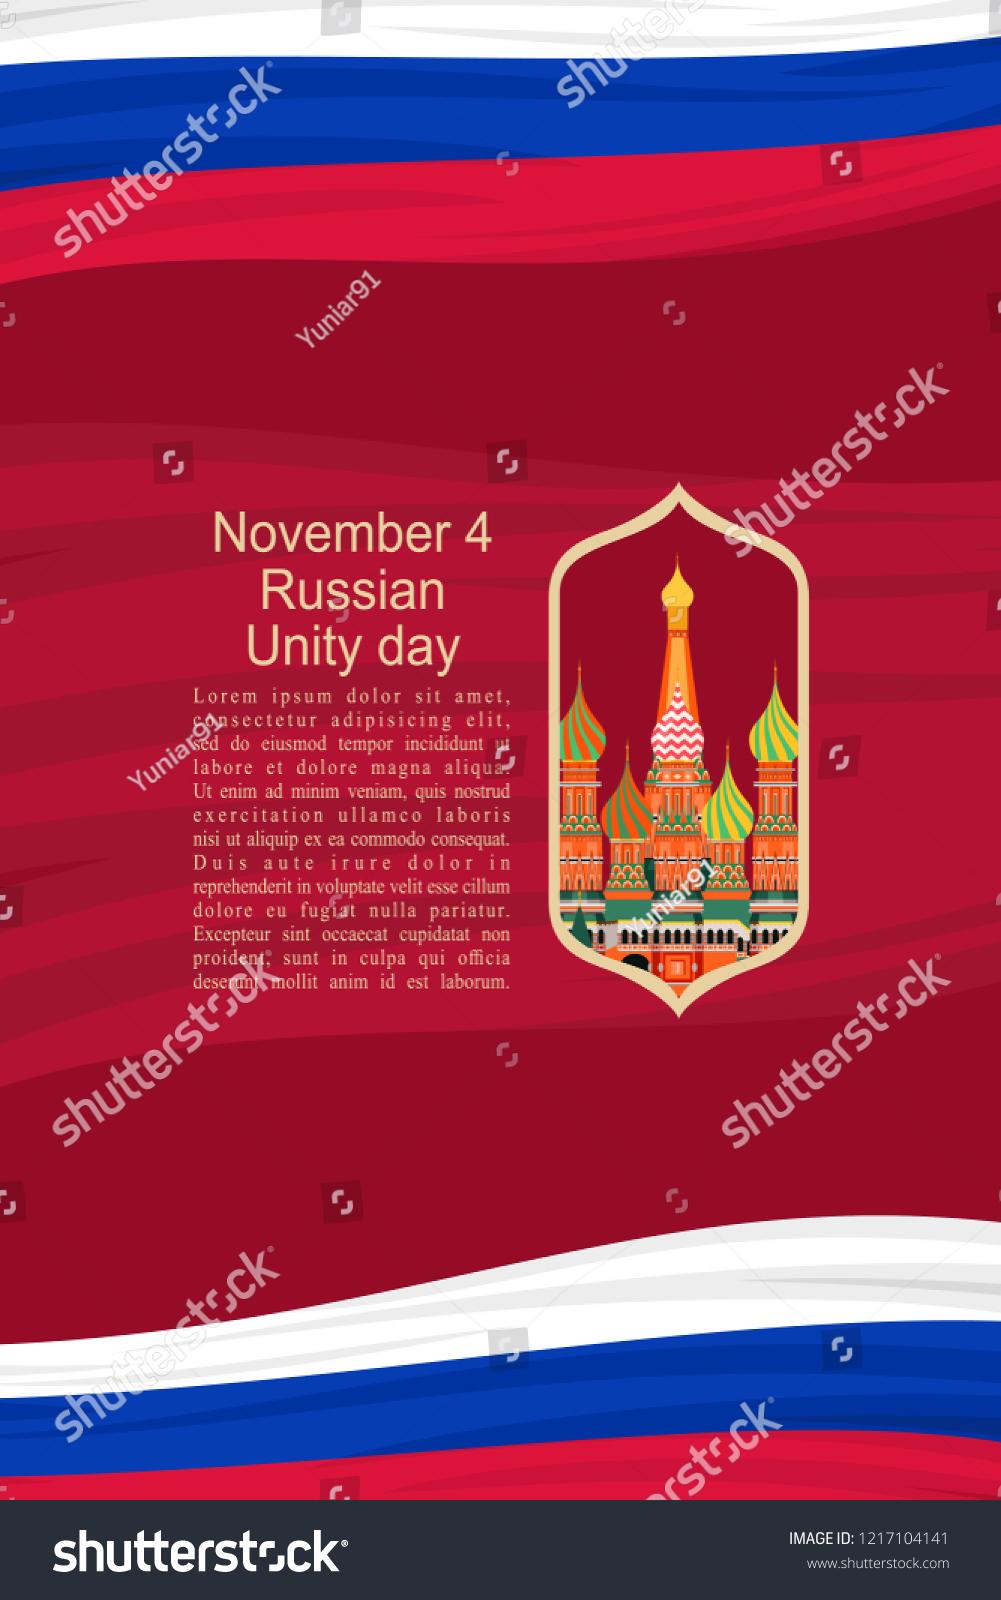 November 4 Russian Unity Day Vector Stock Vector (Royalty